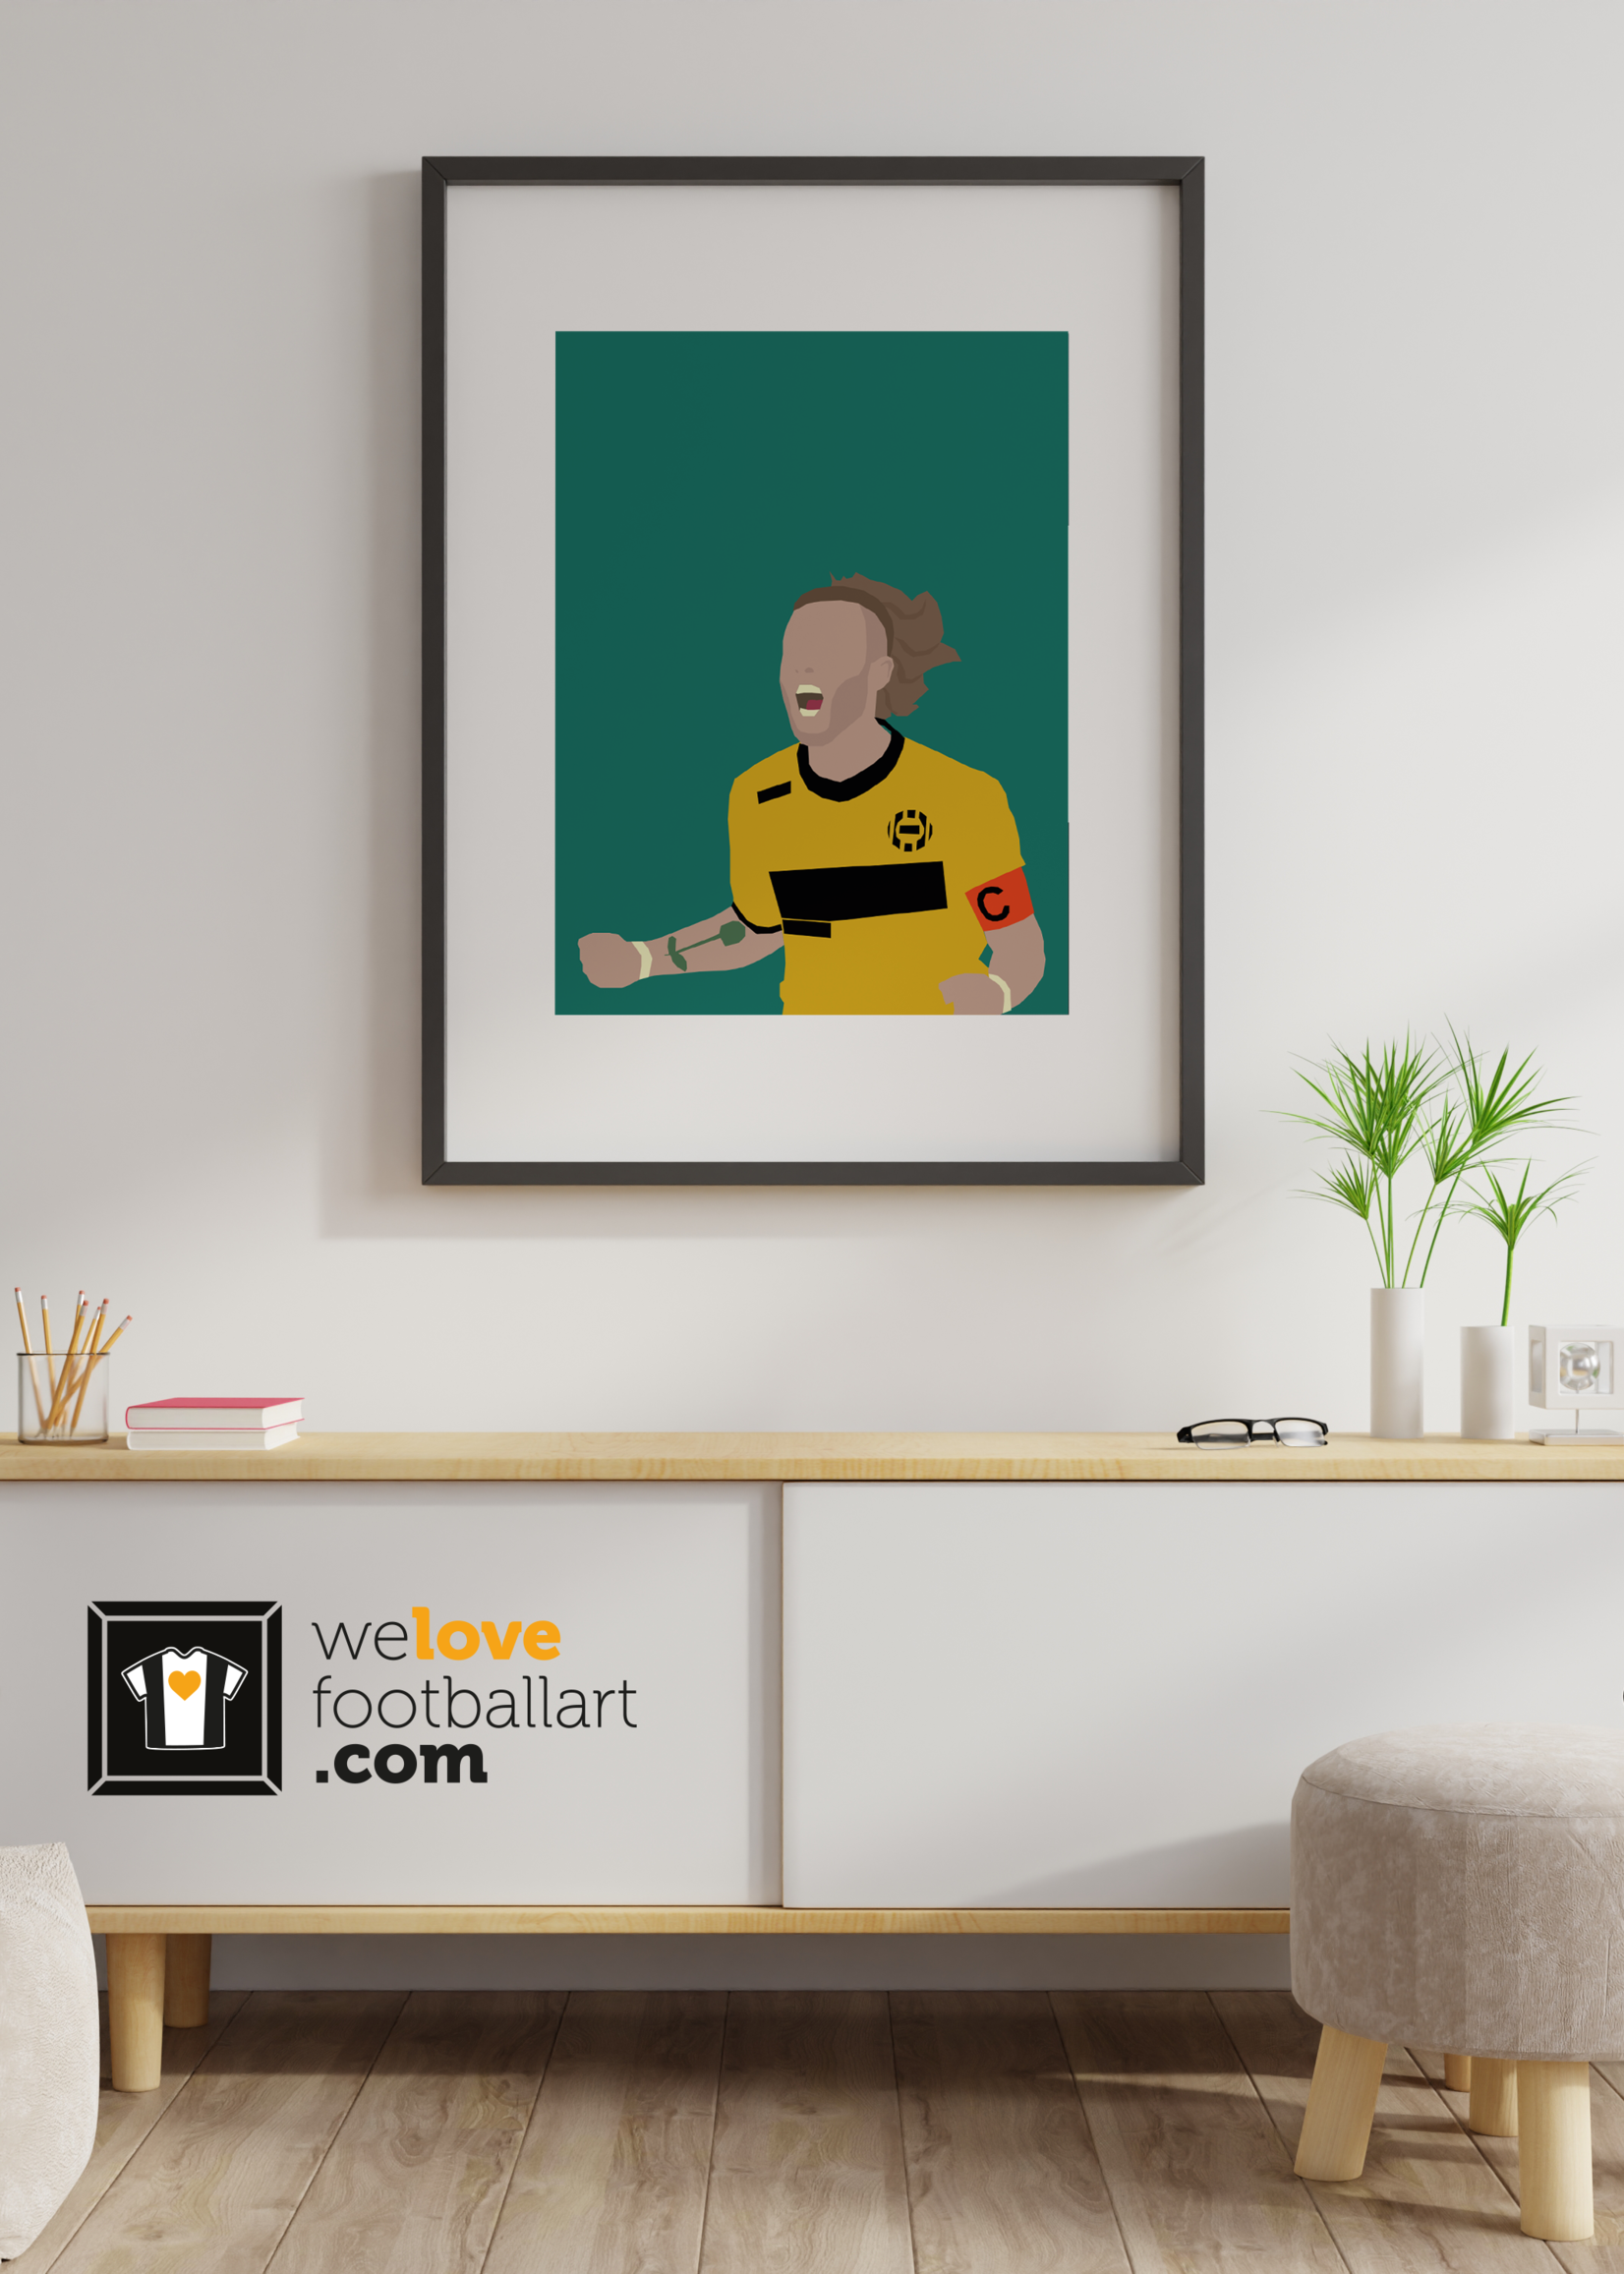 "We Love Football Art ""Boys what are we happy"" We Love Football Art"